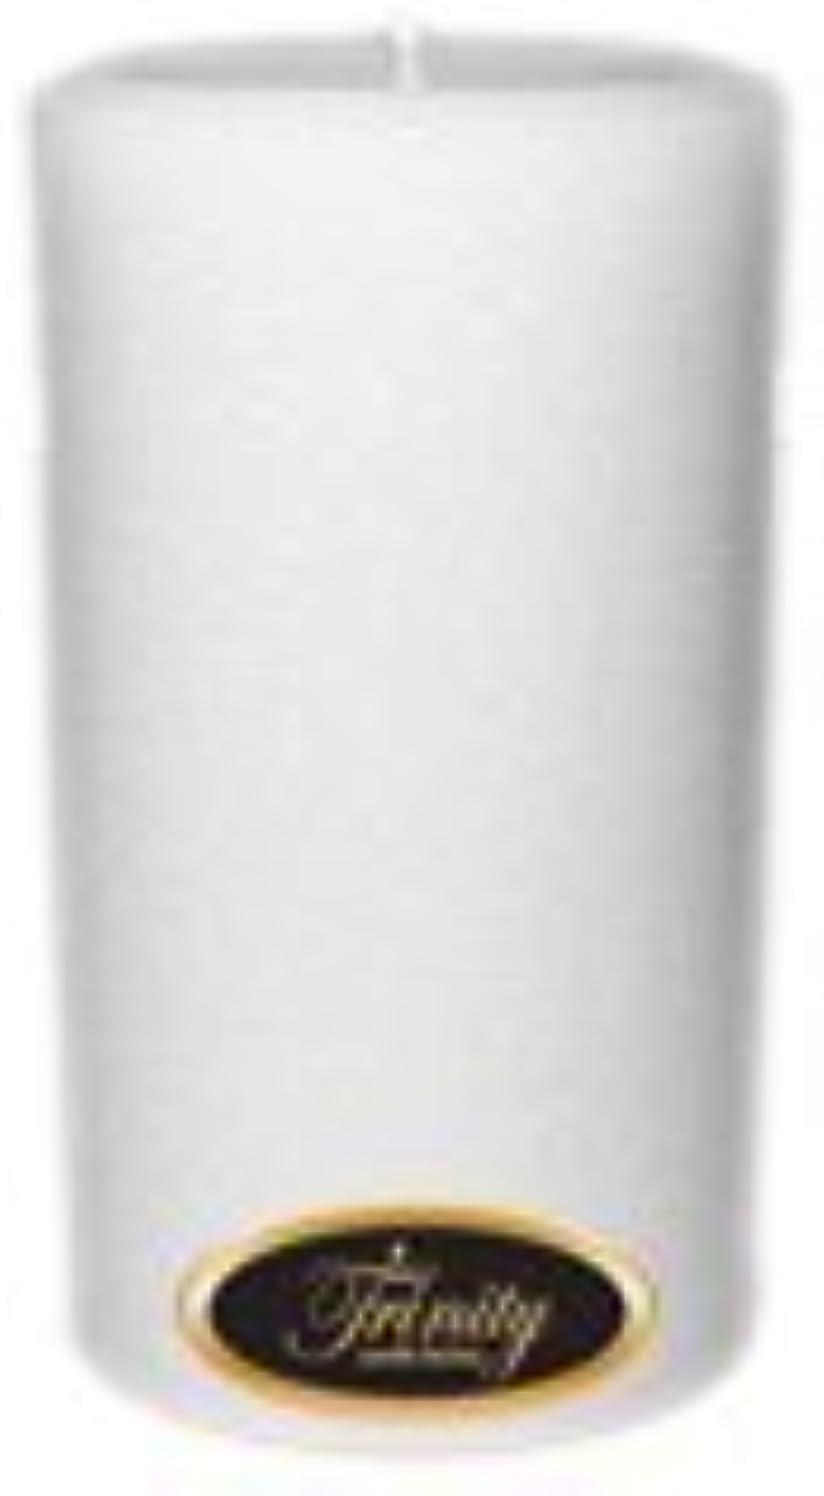 記録在庫後世Trinity Candle工場 – Magnolia – Pillar Candle – 3 x 6